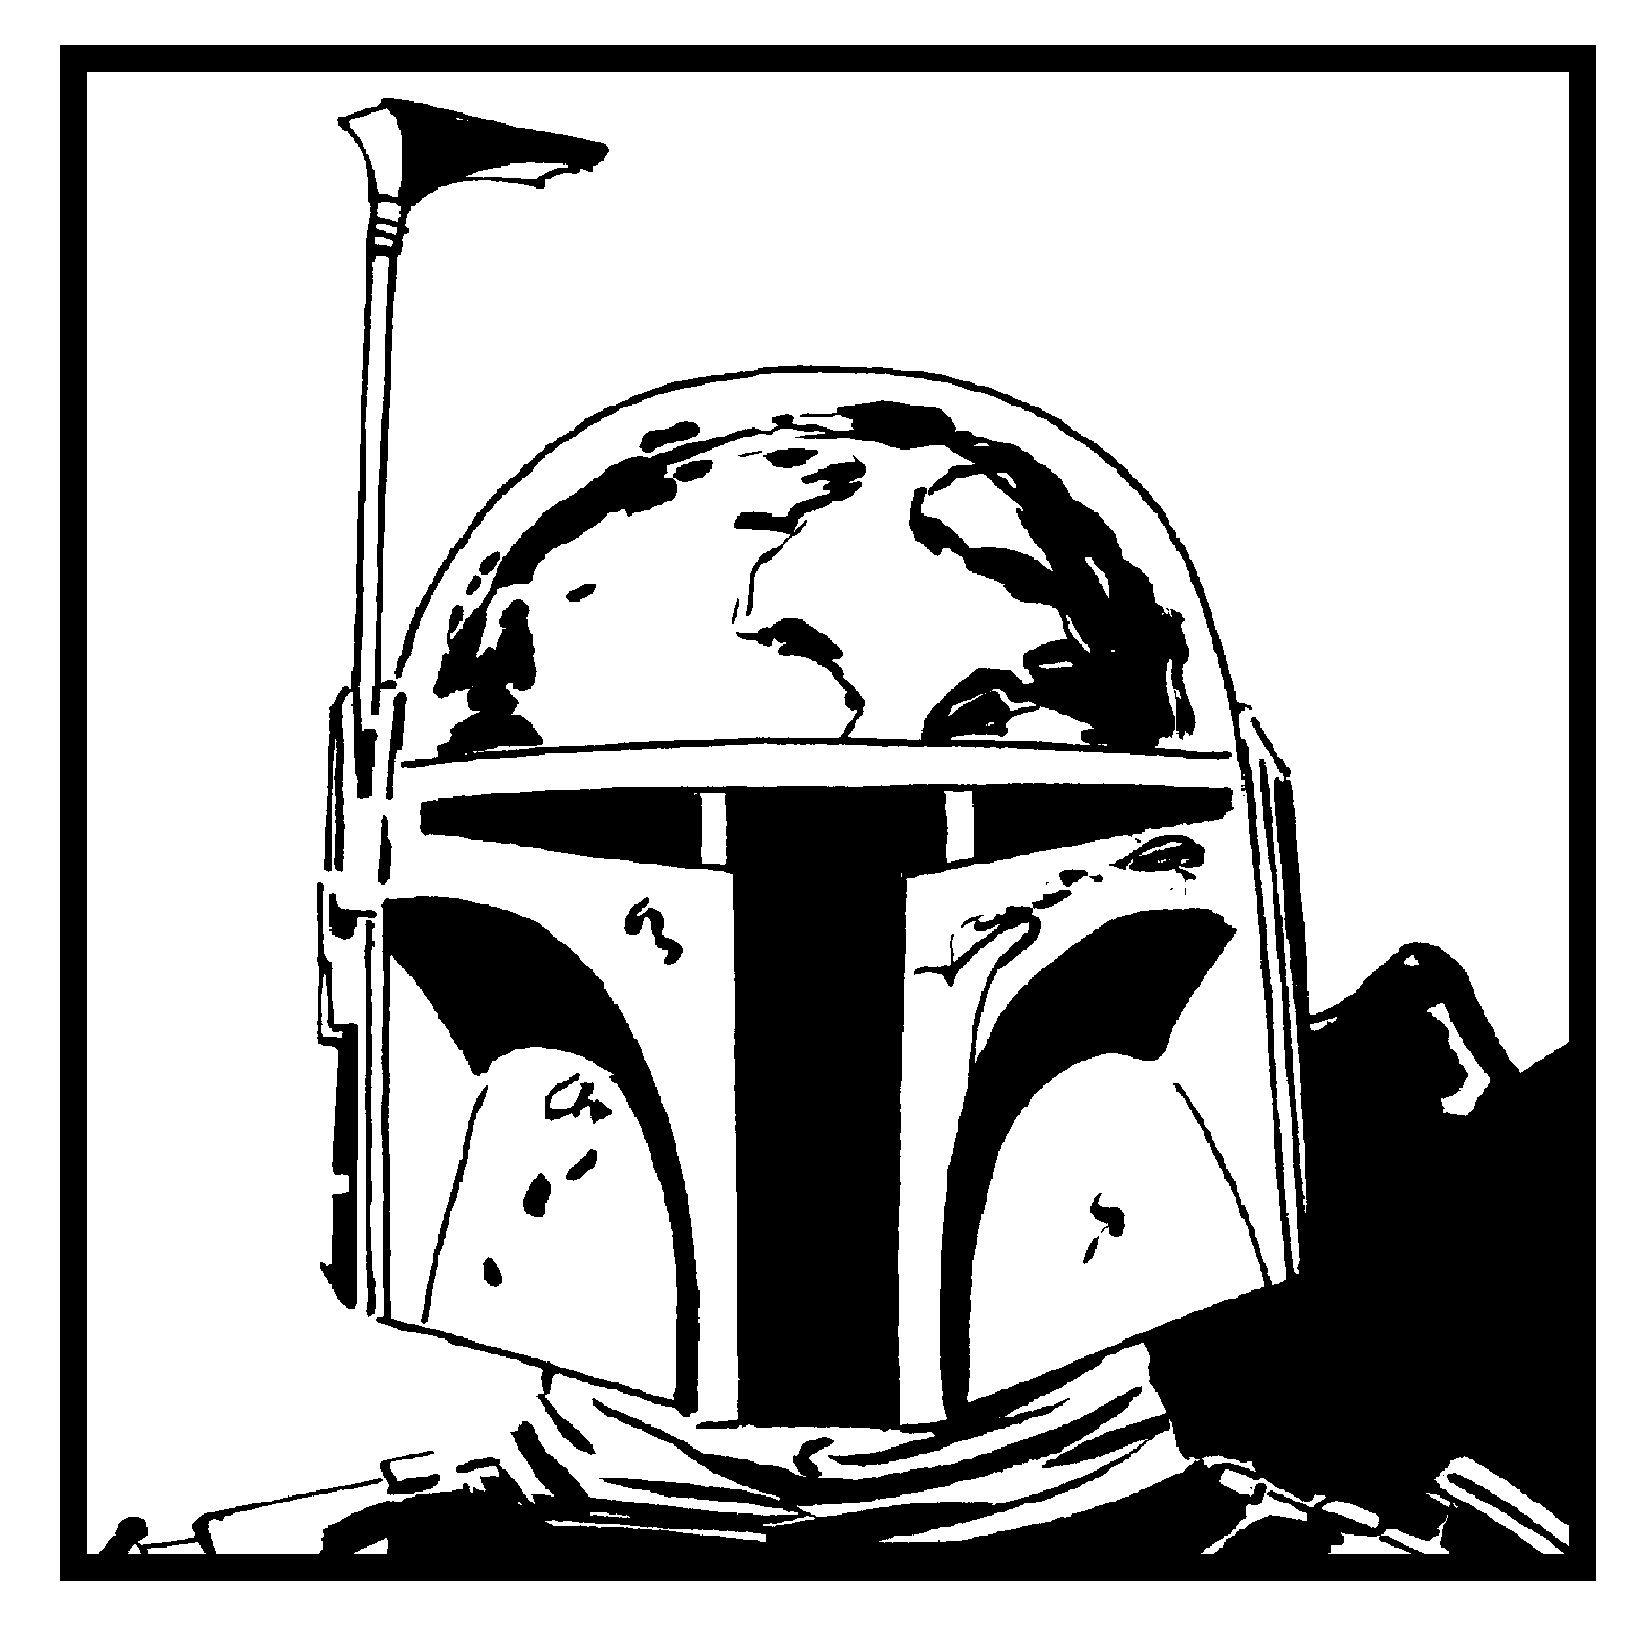 boba fett helmet sketch templates Best Boba Fett Helmet